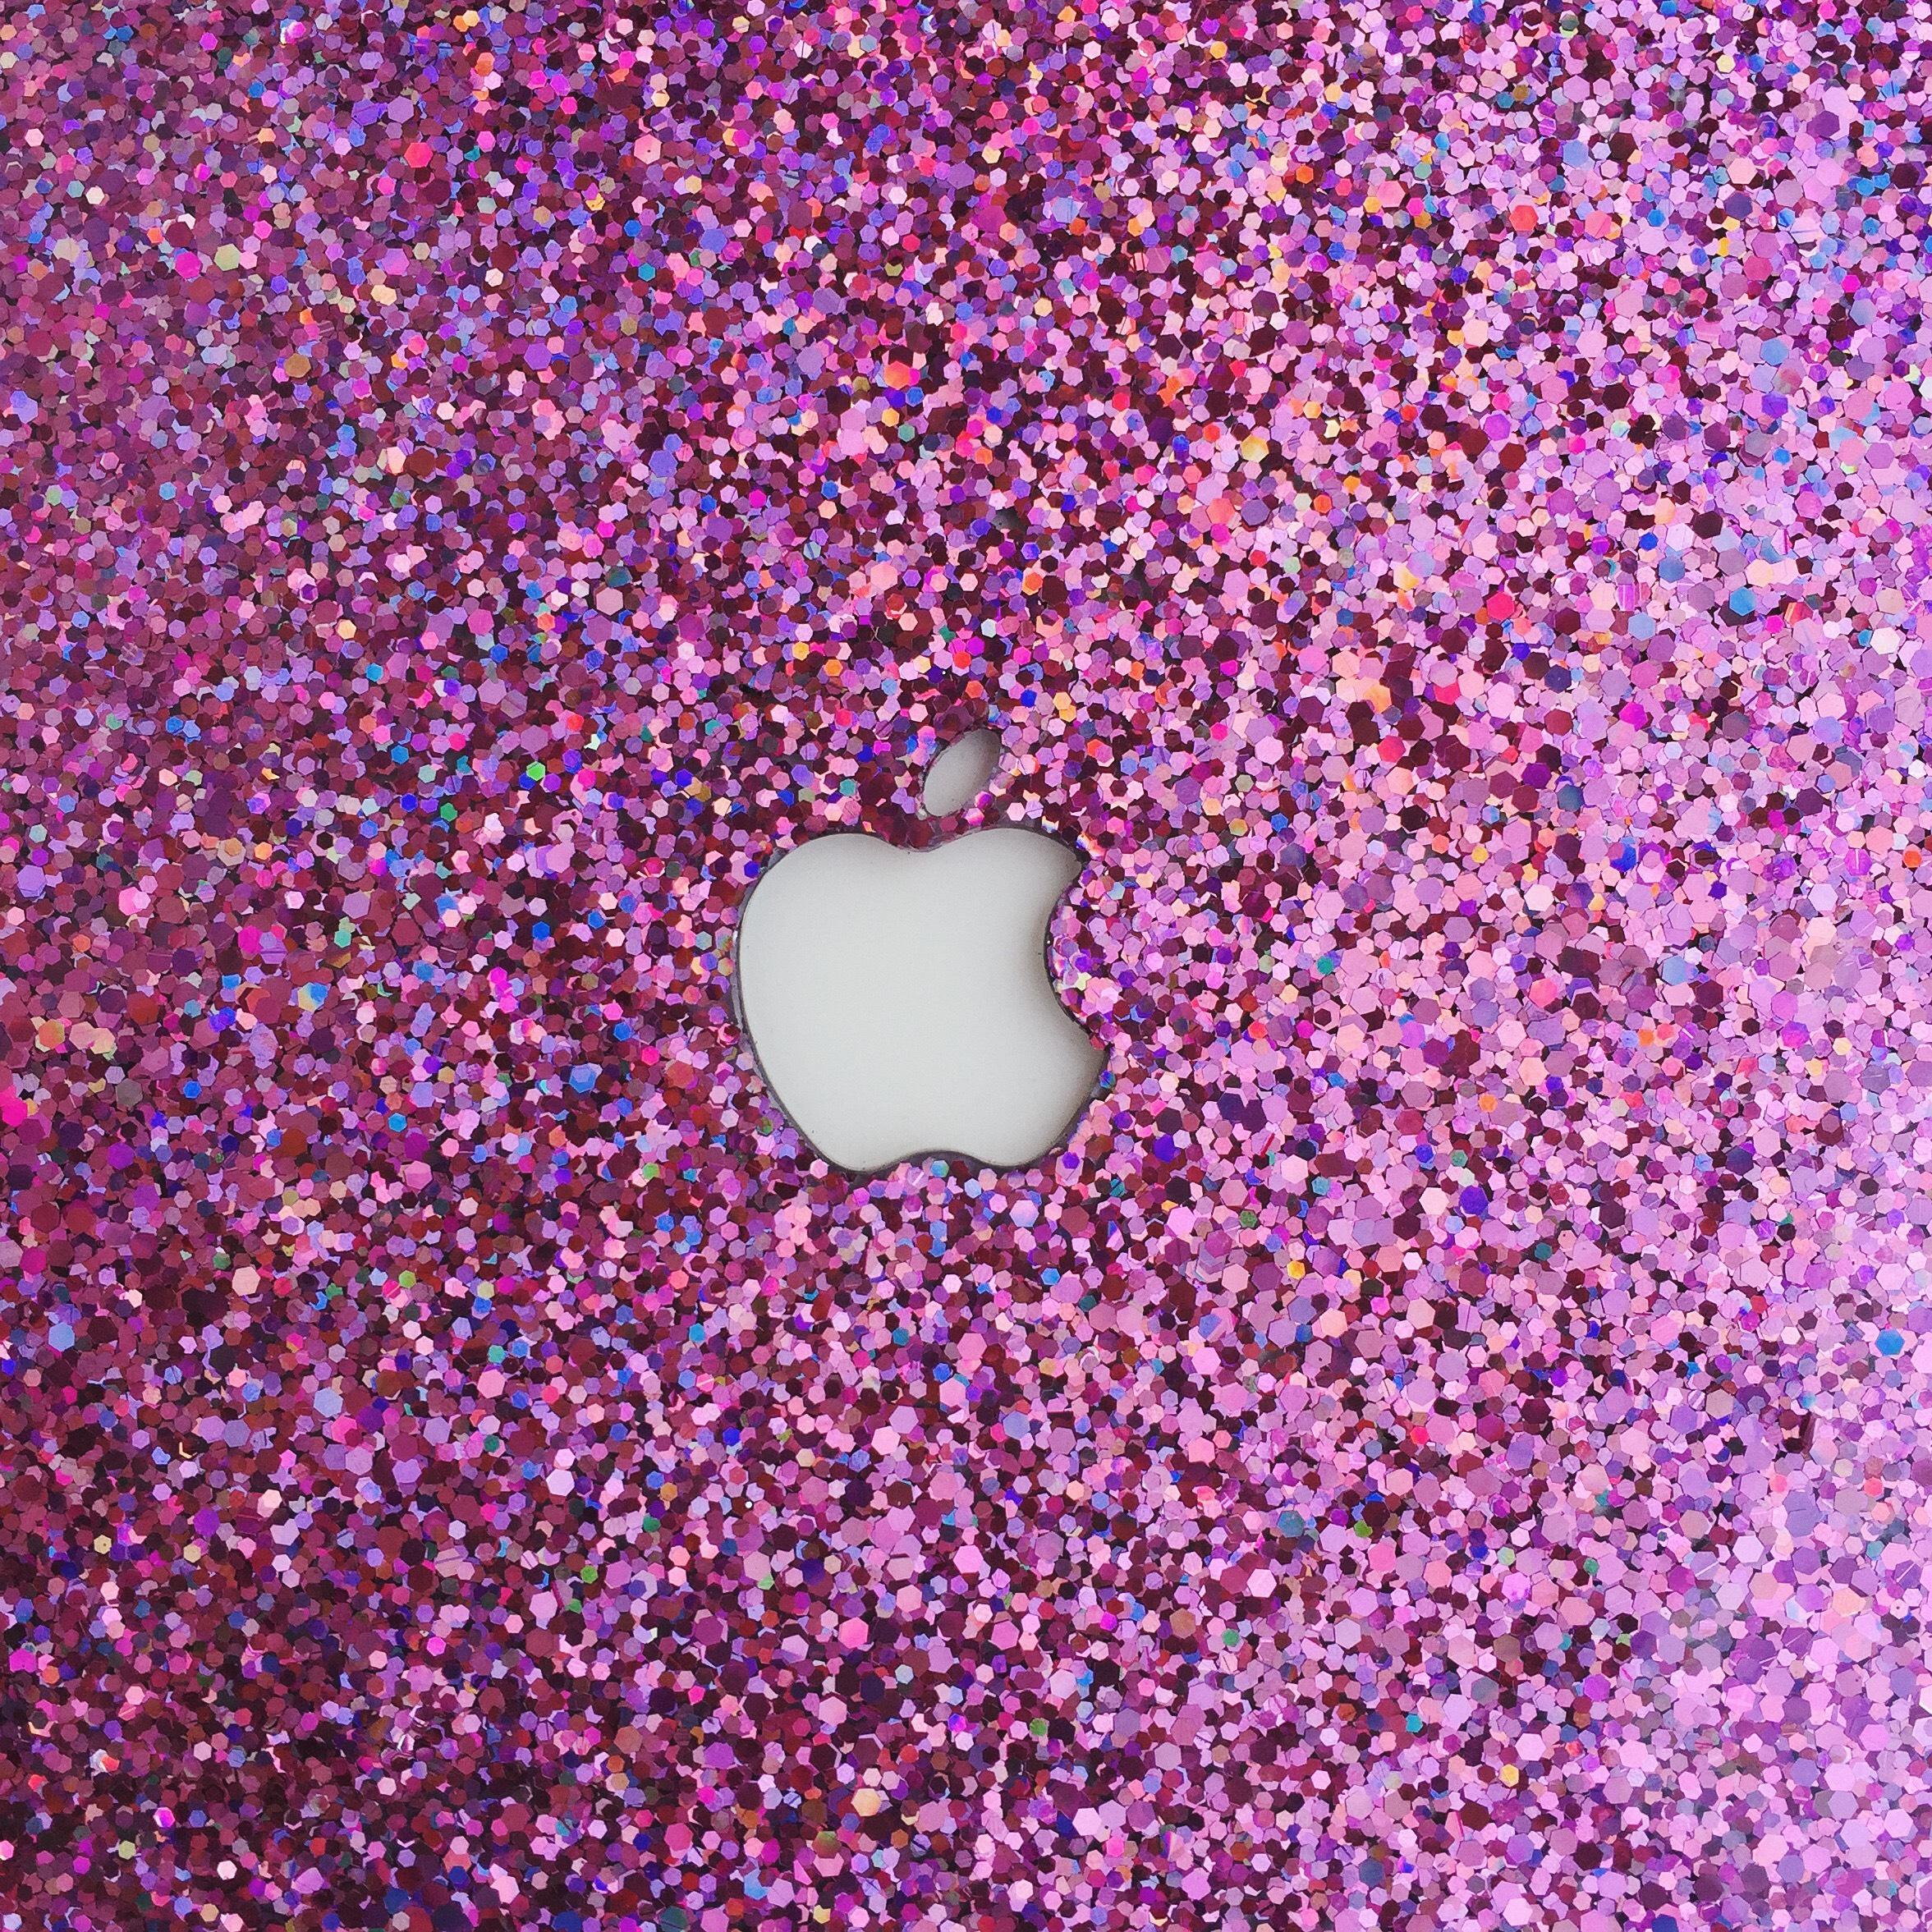 Macbook,Macbookcase,MacBookPro,Macbookair,Macbookretina,glitter,Glittercase,เคสกลิตเตอร์,เคสกากเพชร,เคสแม็คบุ๊ค,Macbookglittercase,Hologram,traceryshop,Pink